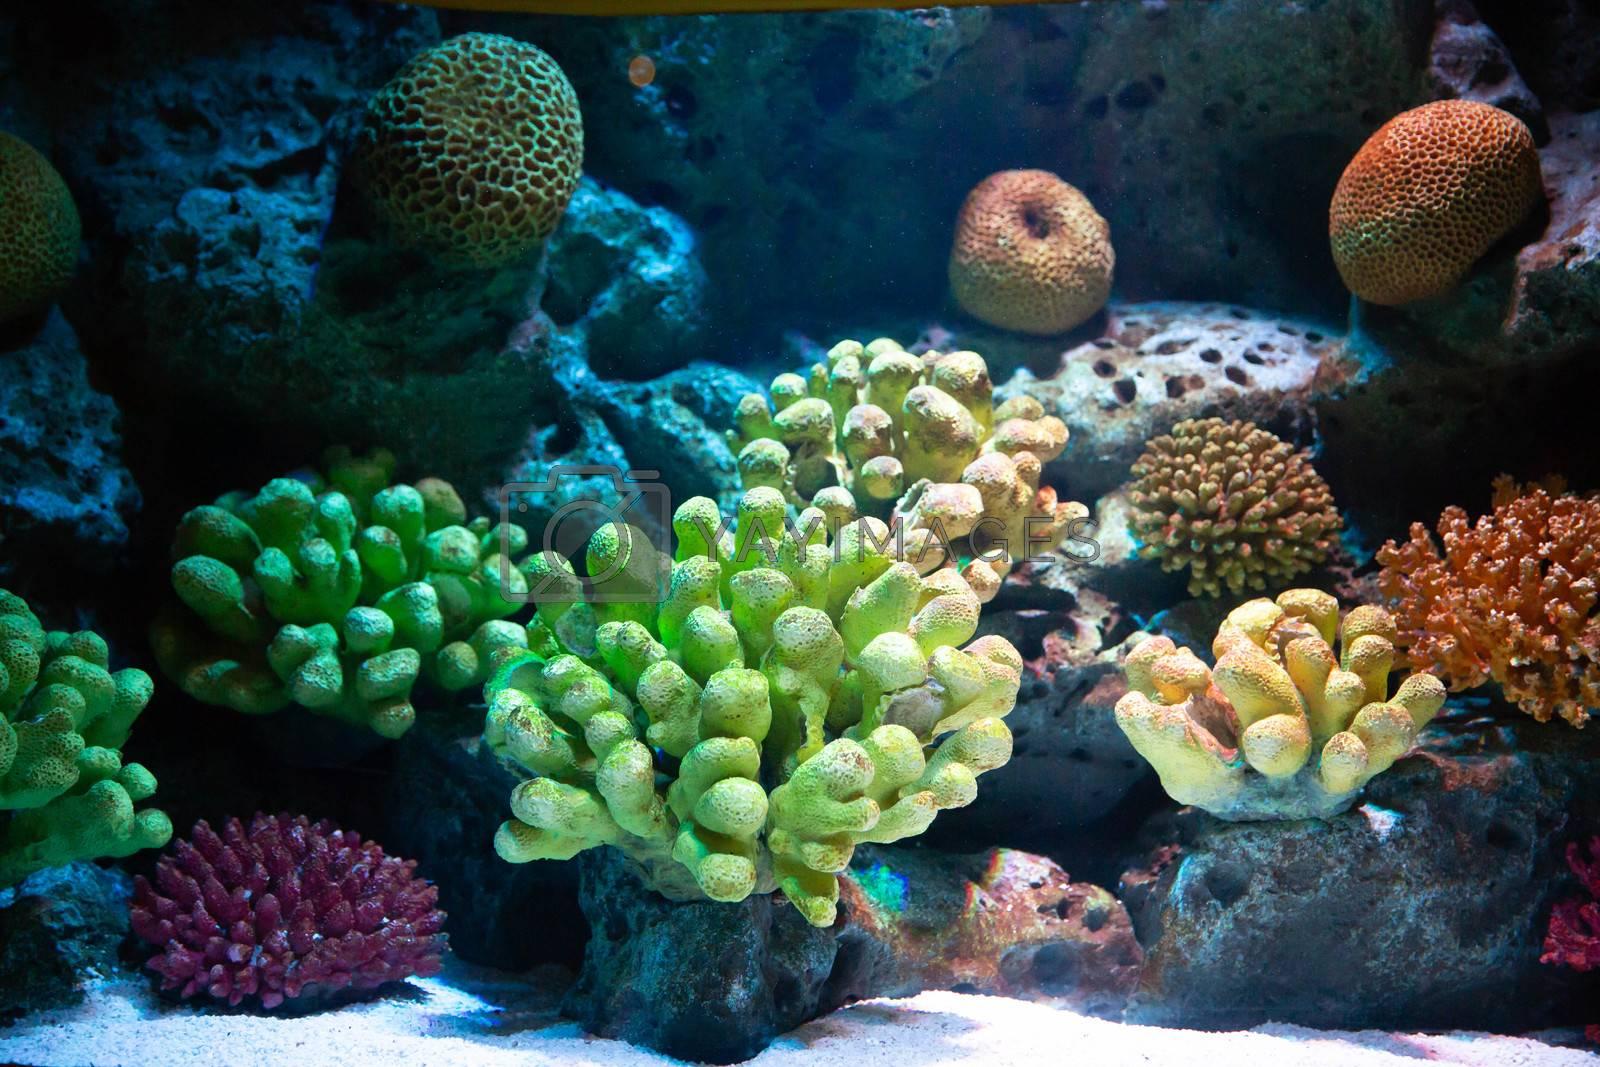 Flower sea living coral and reef colorful under deep water of sea ocean